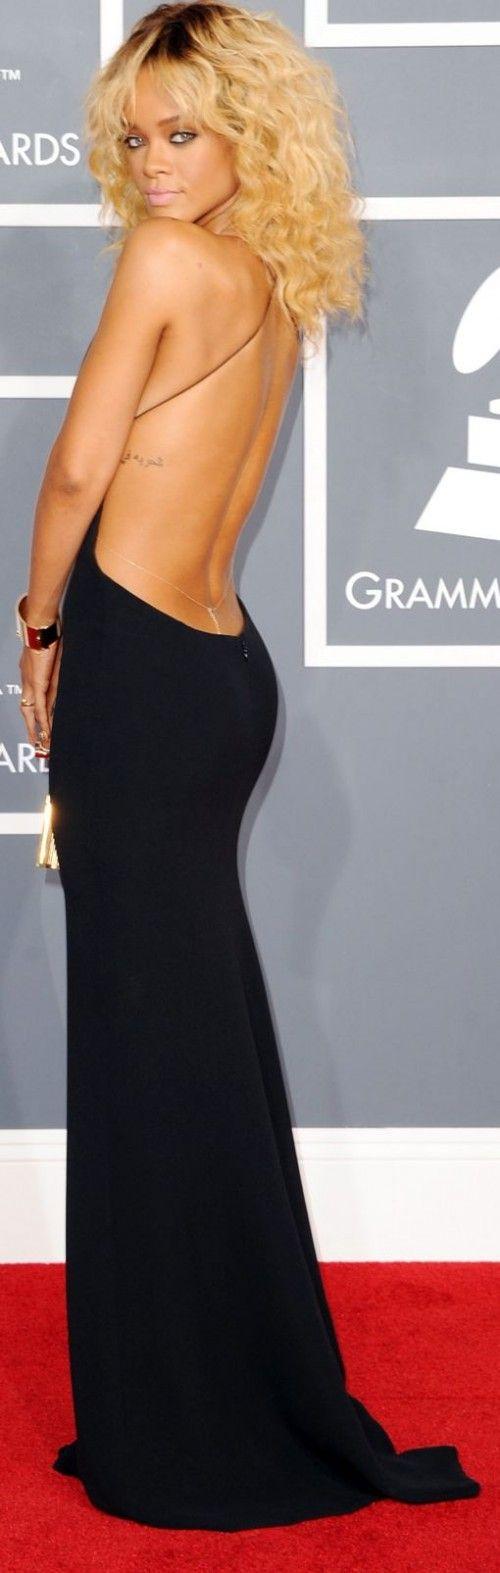 Rihanna #Chic